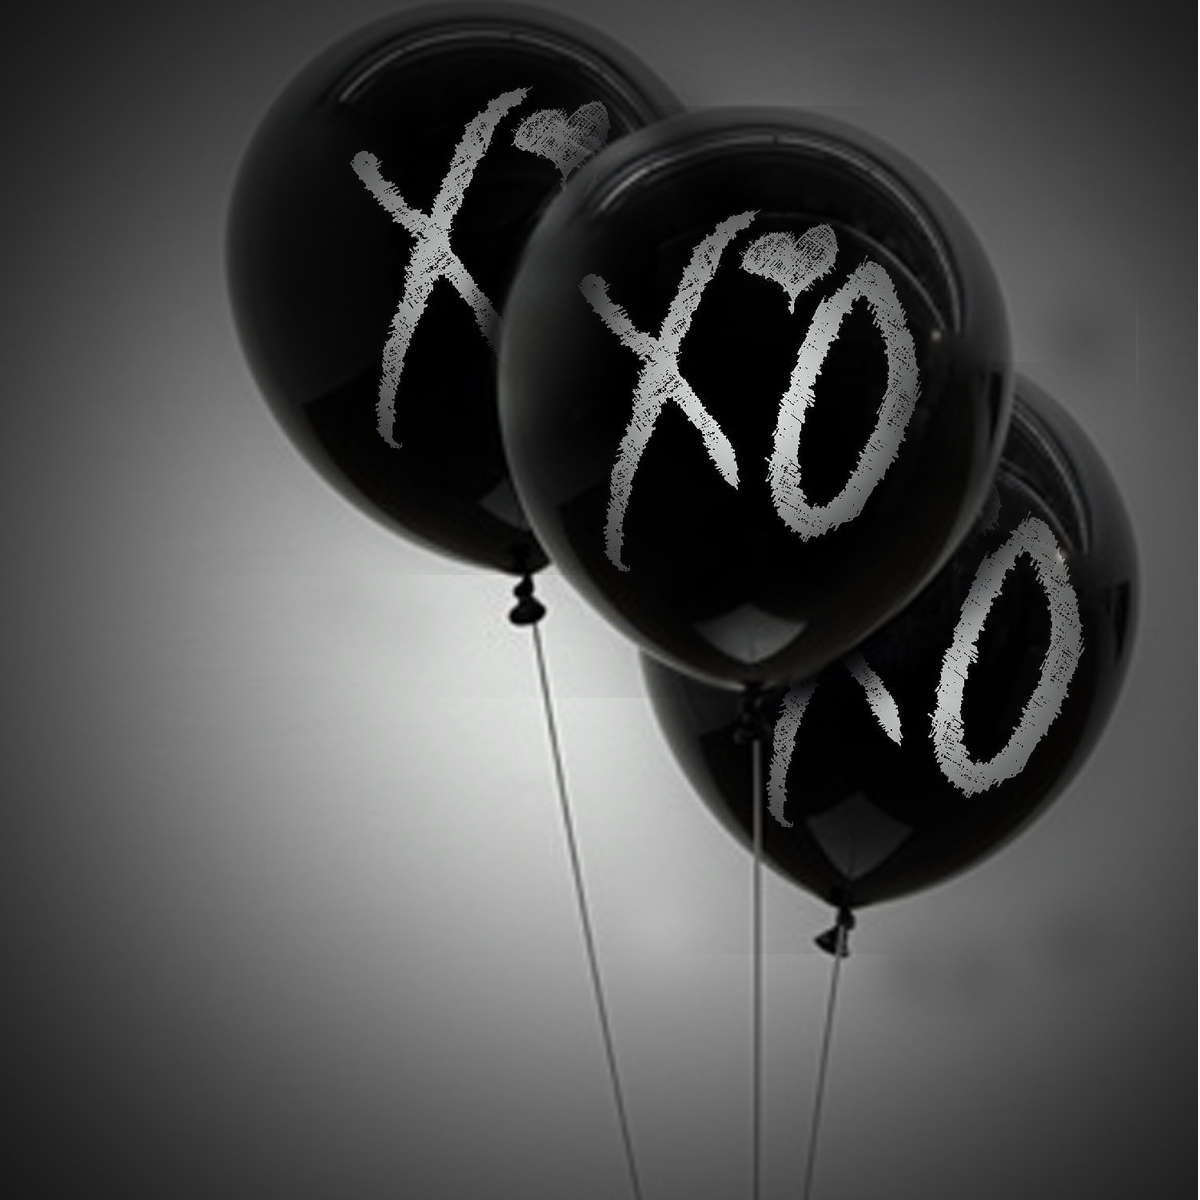 Xo The Weeknd The Weeknd XO by eight...